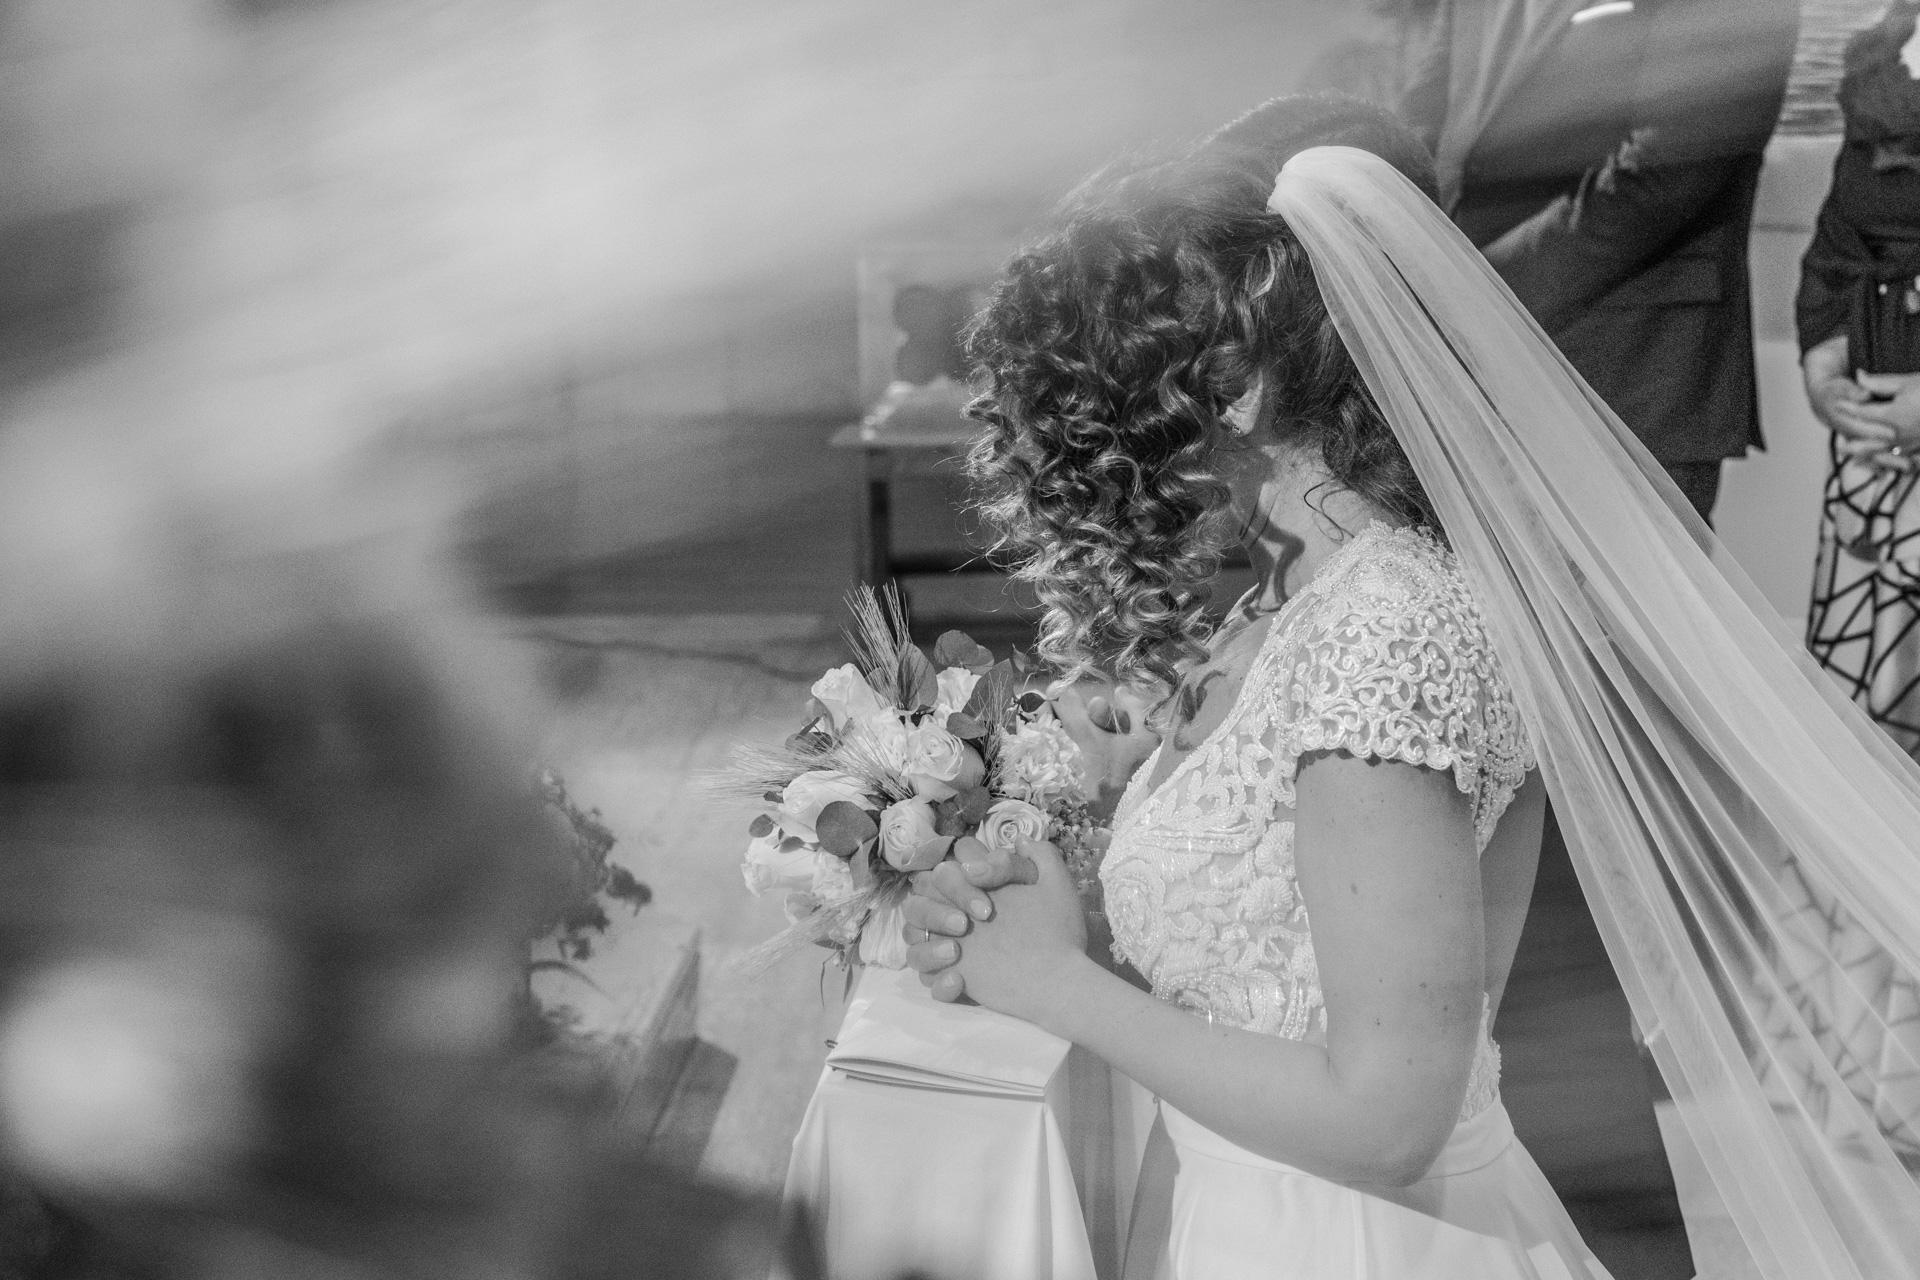 merafina photographer alfonso merafina giusi e riccardo wedding